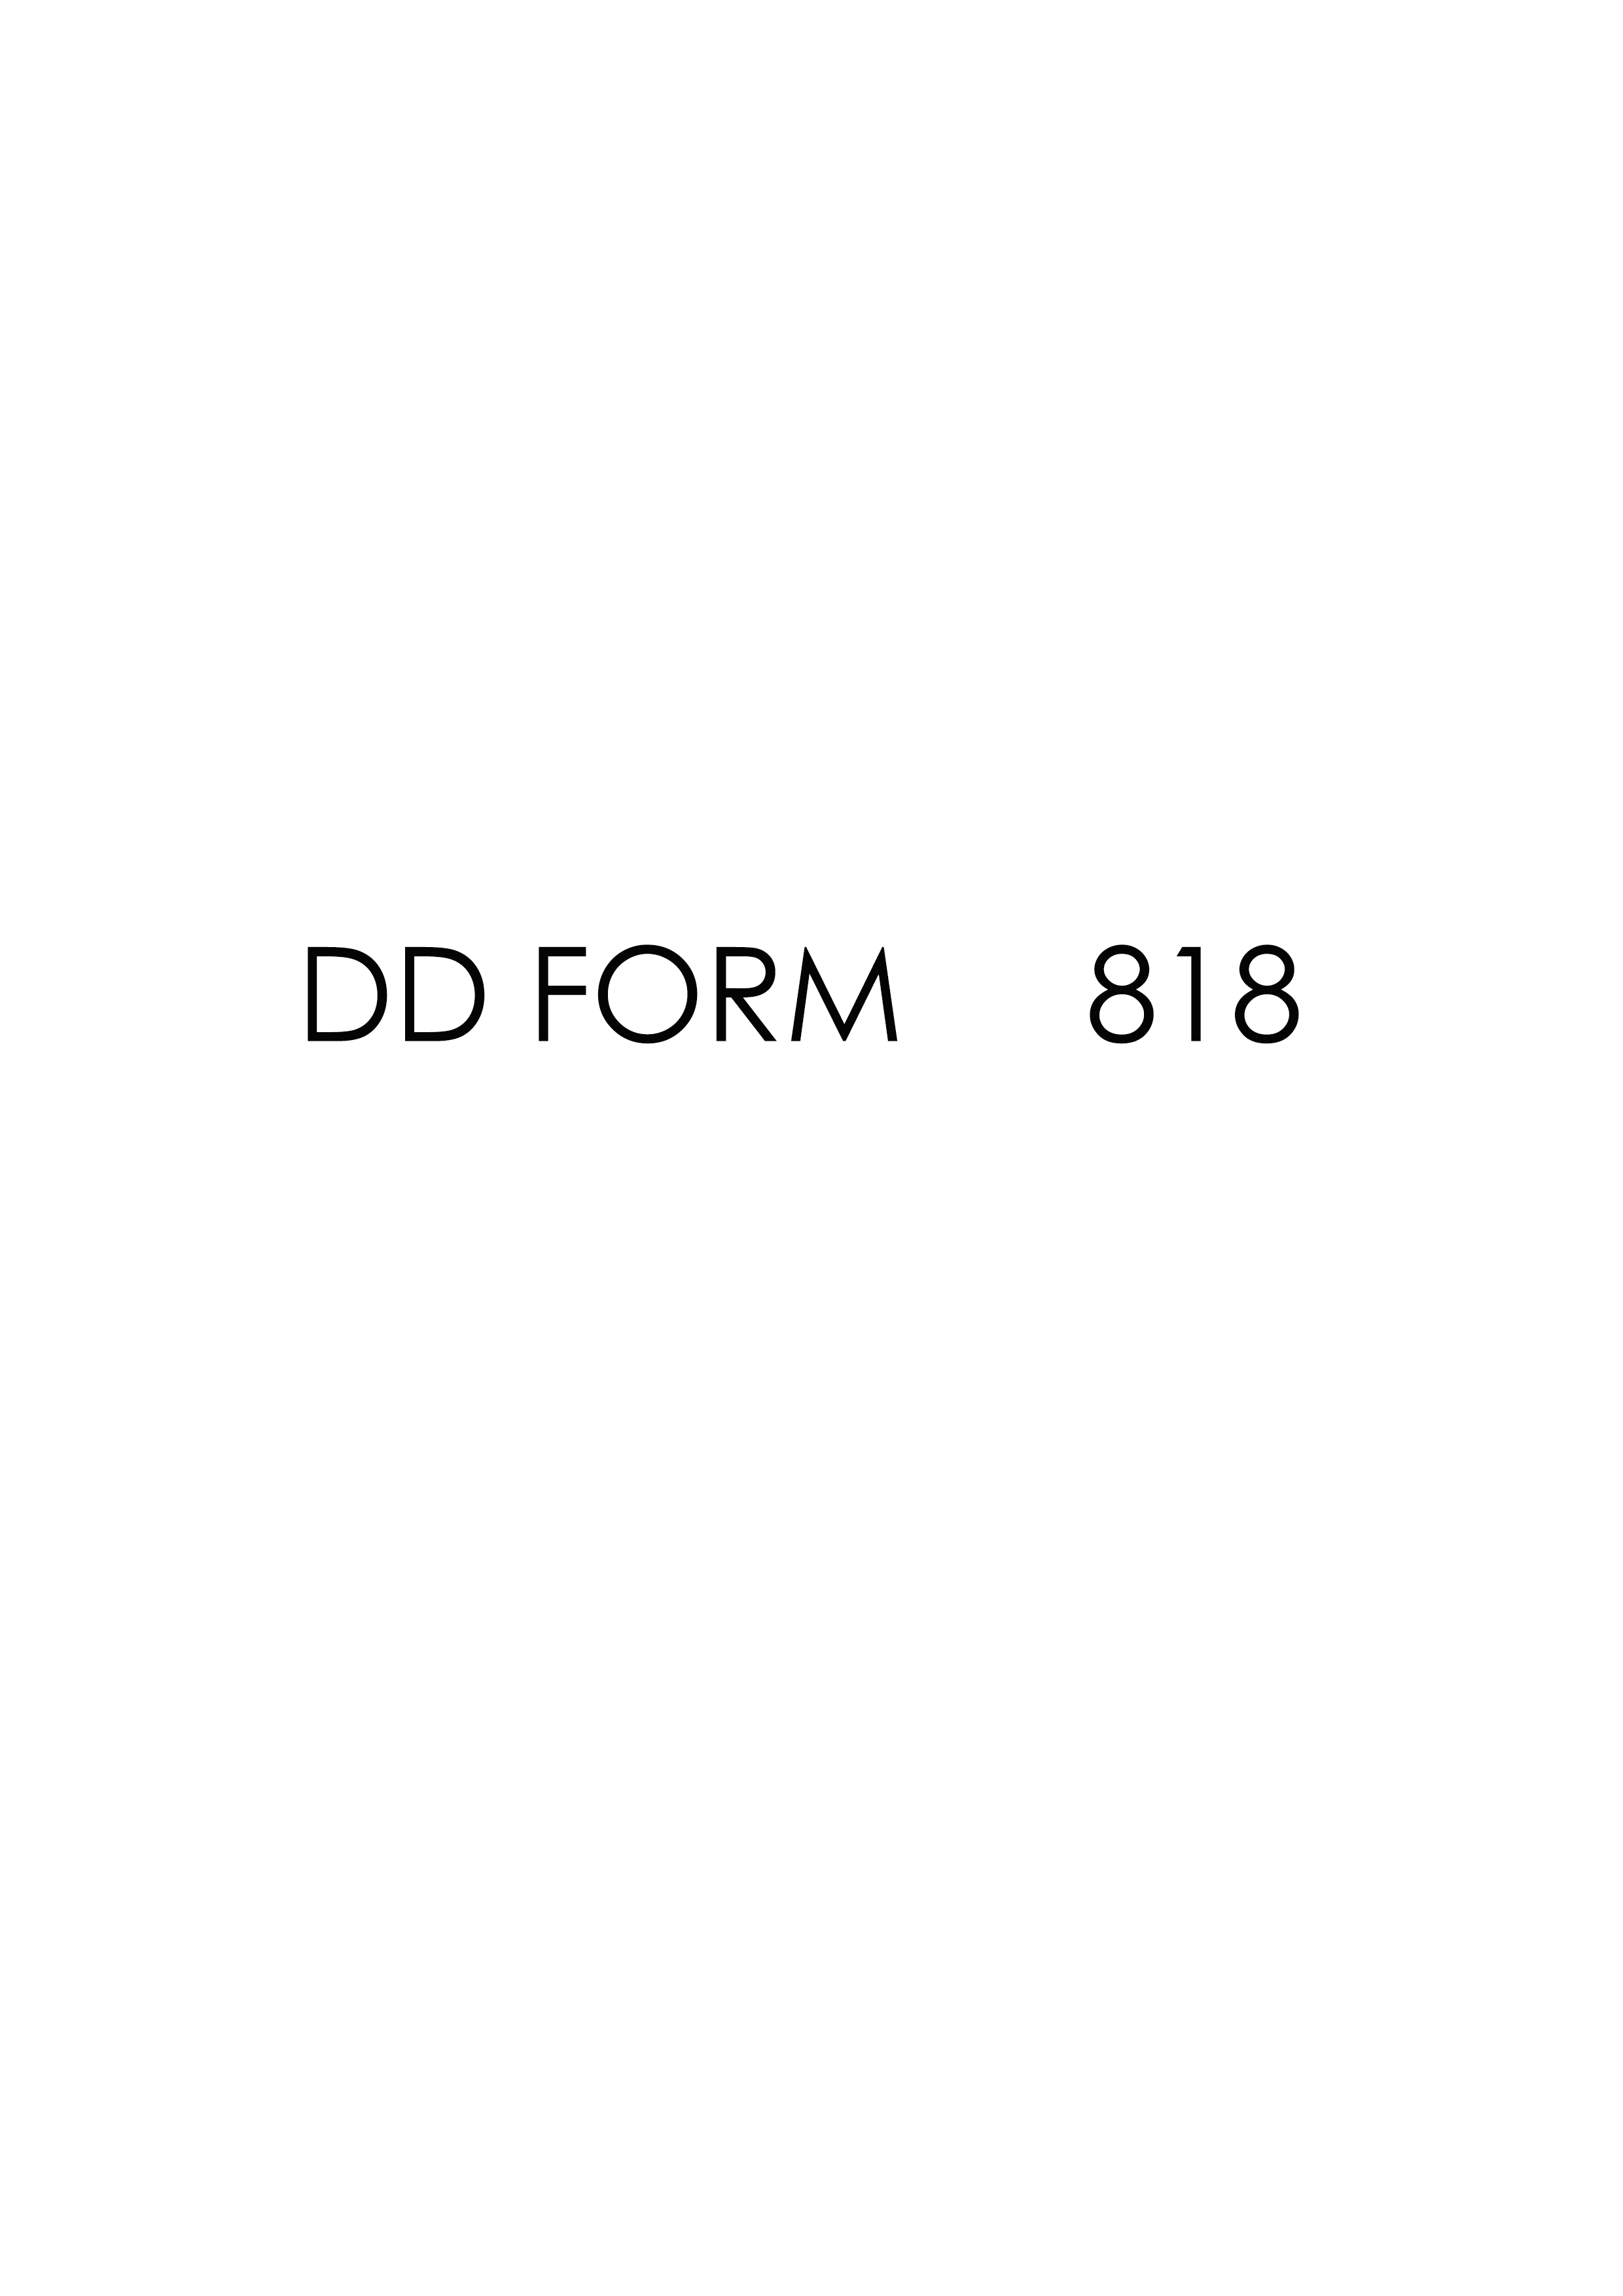 Download dd Form 818 Free